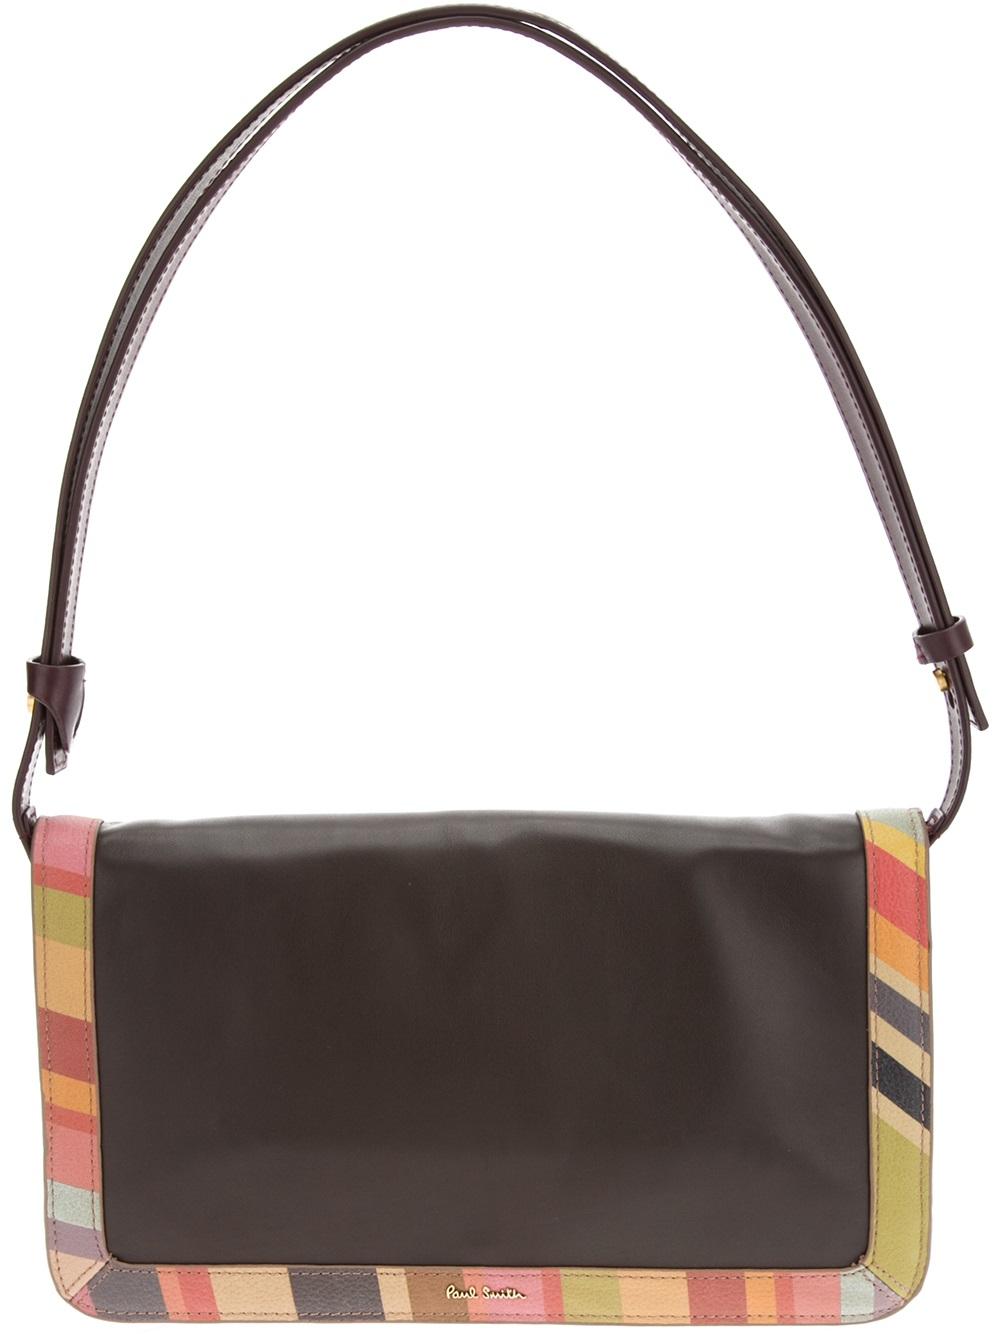 ... quality design a84c3 03538 Lyst - Paul Smith Swirl Trim Shoulder Bag in  Black ... 0088be9641c06